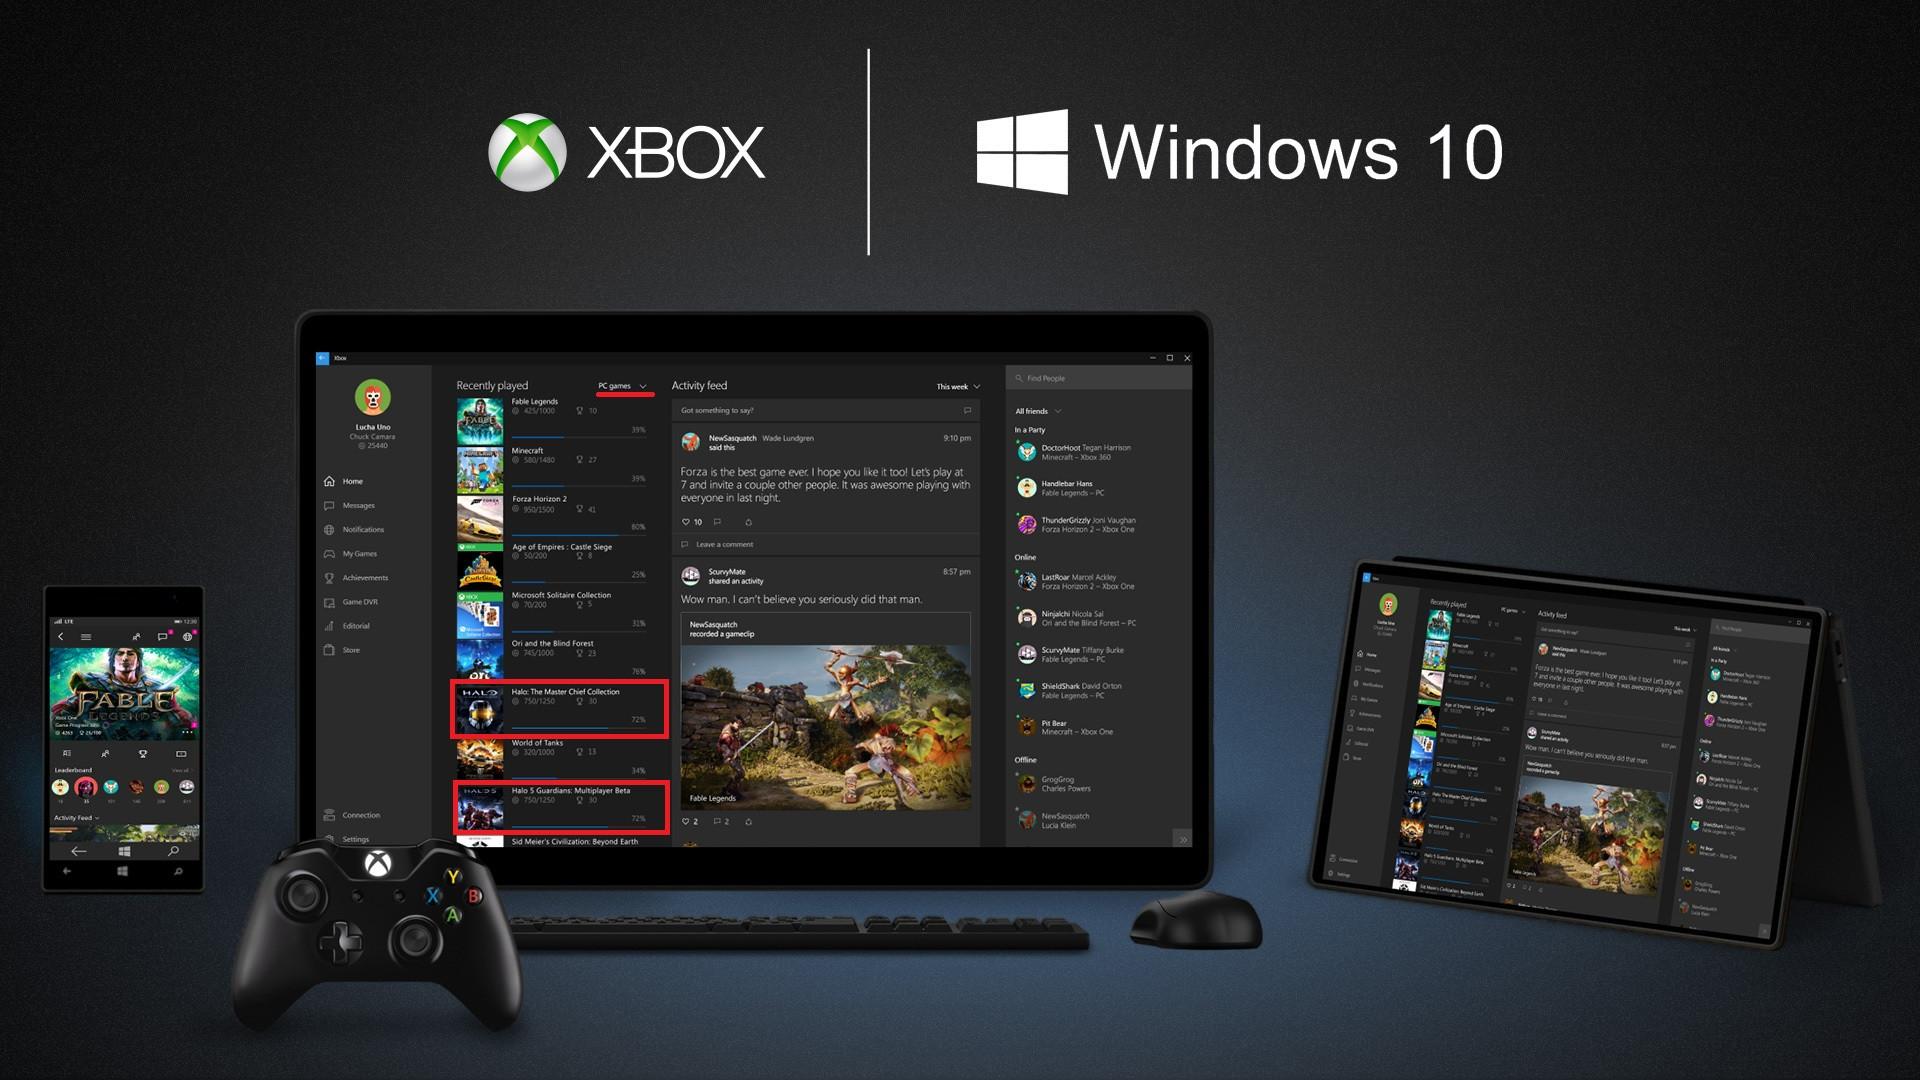 Dostanou se Xbox One hry od Microsoftu na PC? 105024